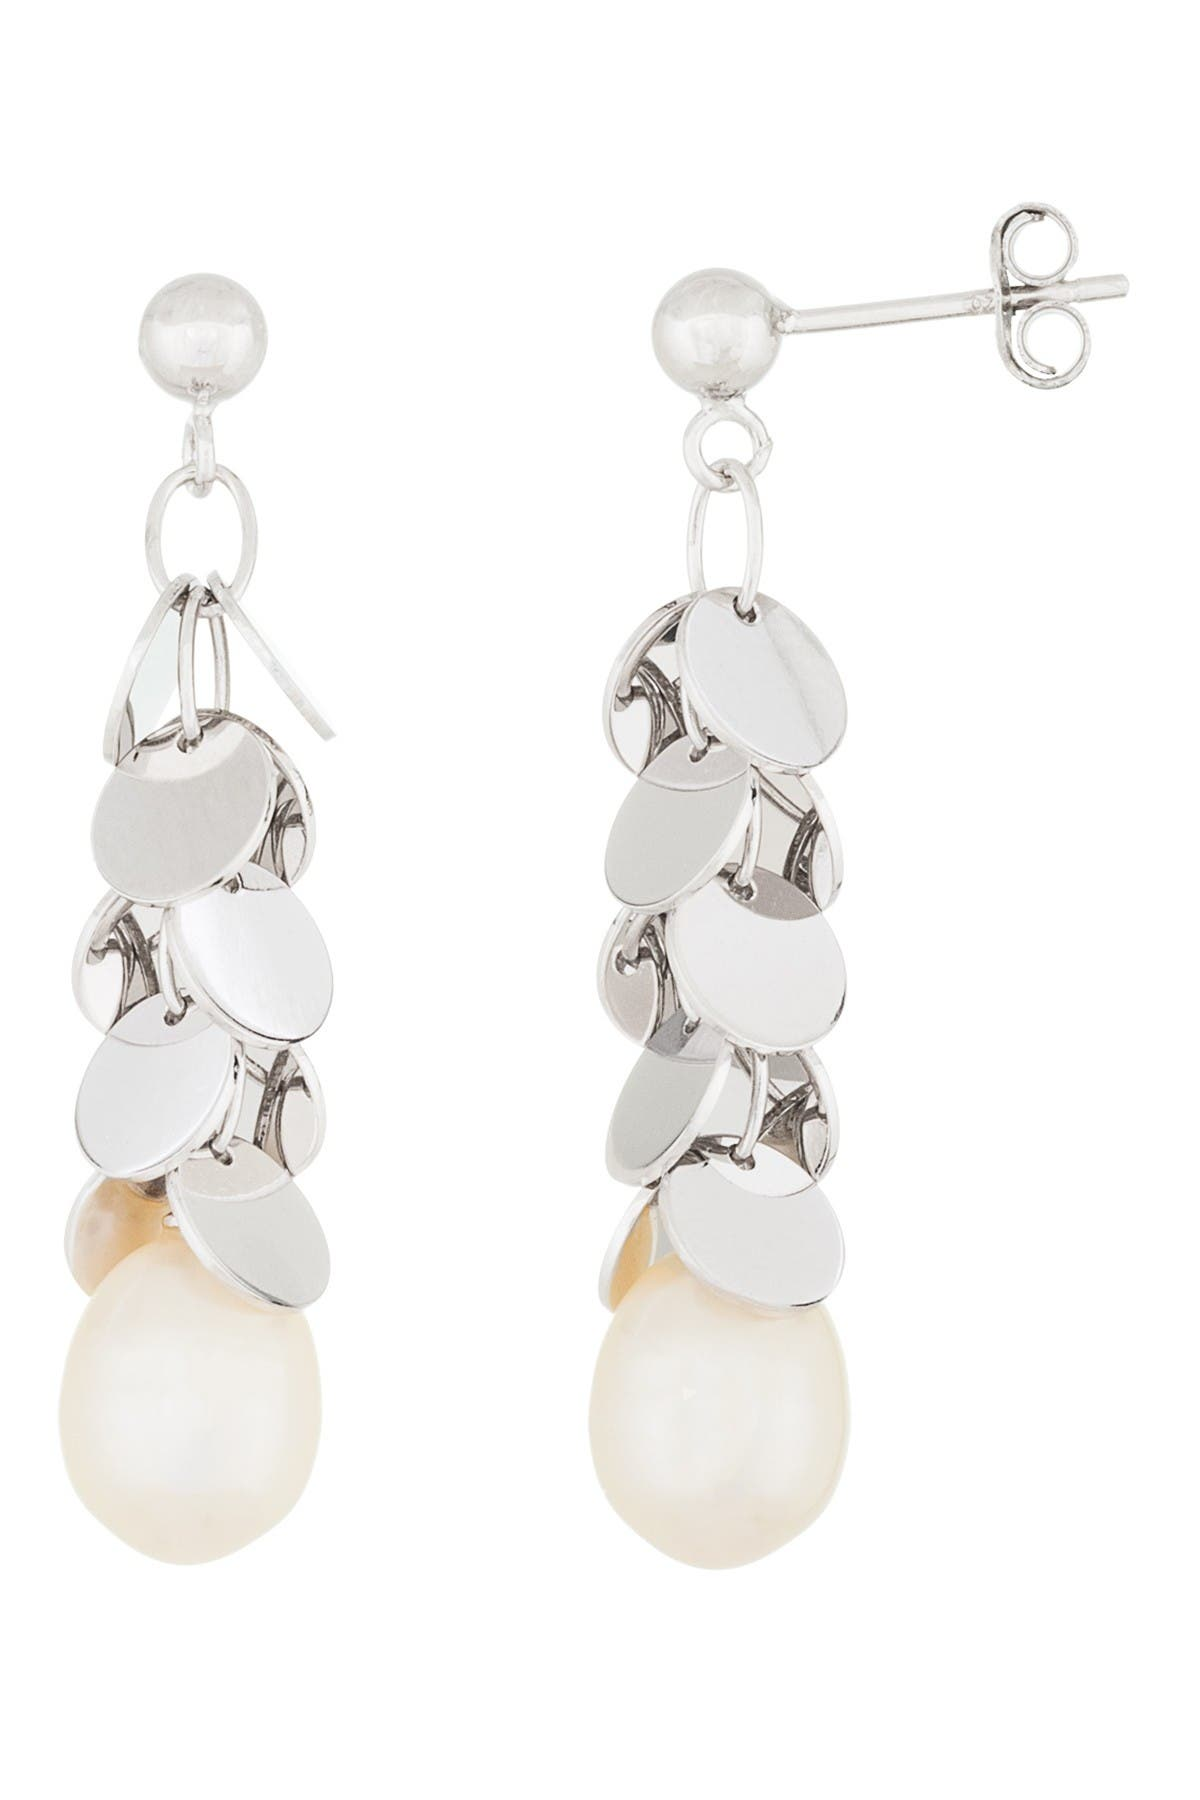 Image of Splendid Pearls Sterling Silver & 7.5-8mm Cultured Freshwater Pearl Dangle Earrings